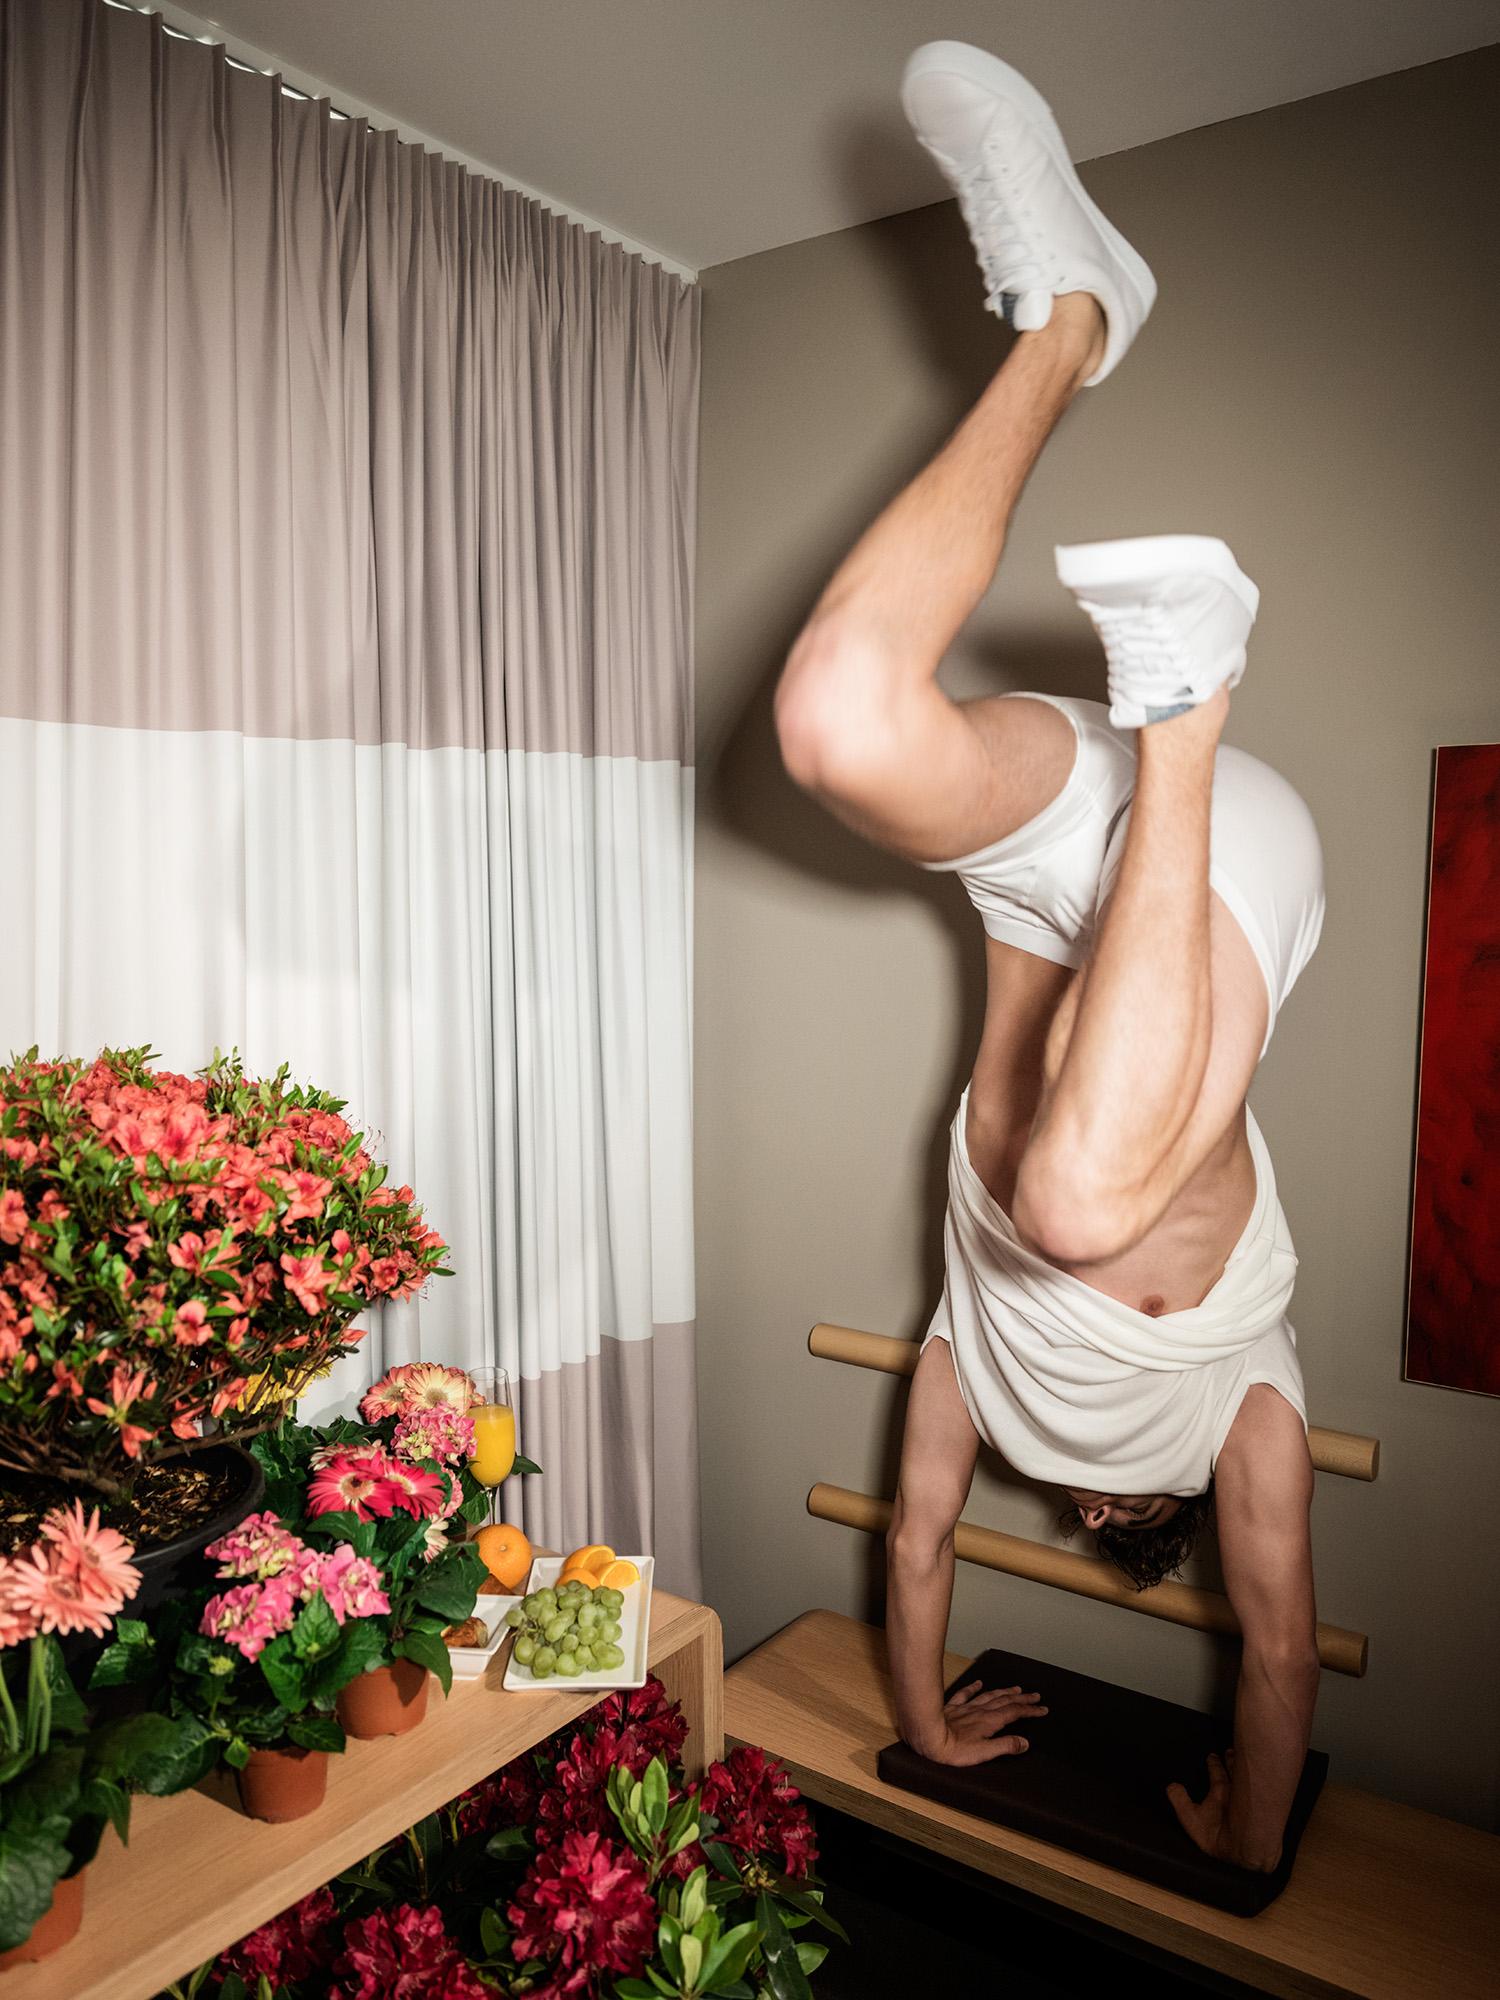 Photographer: Iouri Podladtchikov | Client: Ibis Hotels | Agency: JvM/Limmat